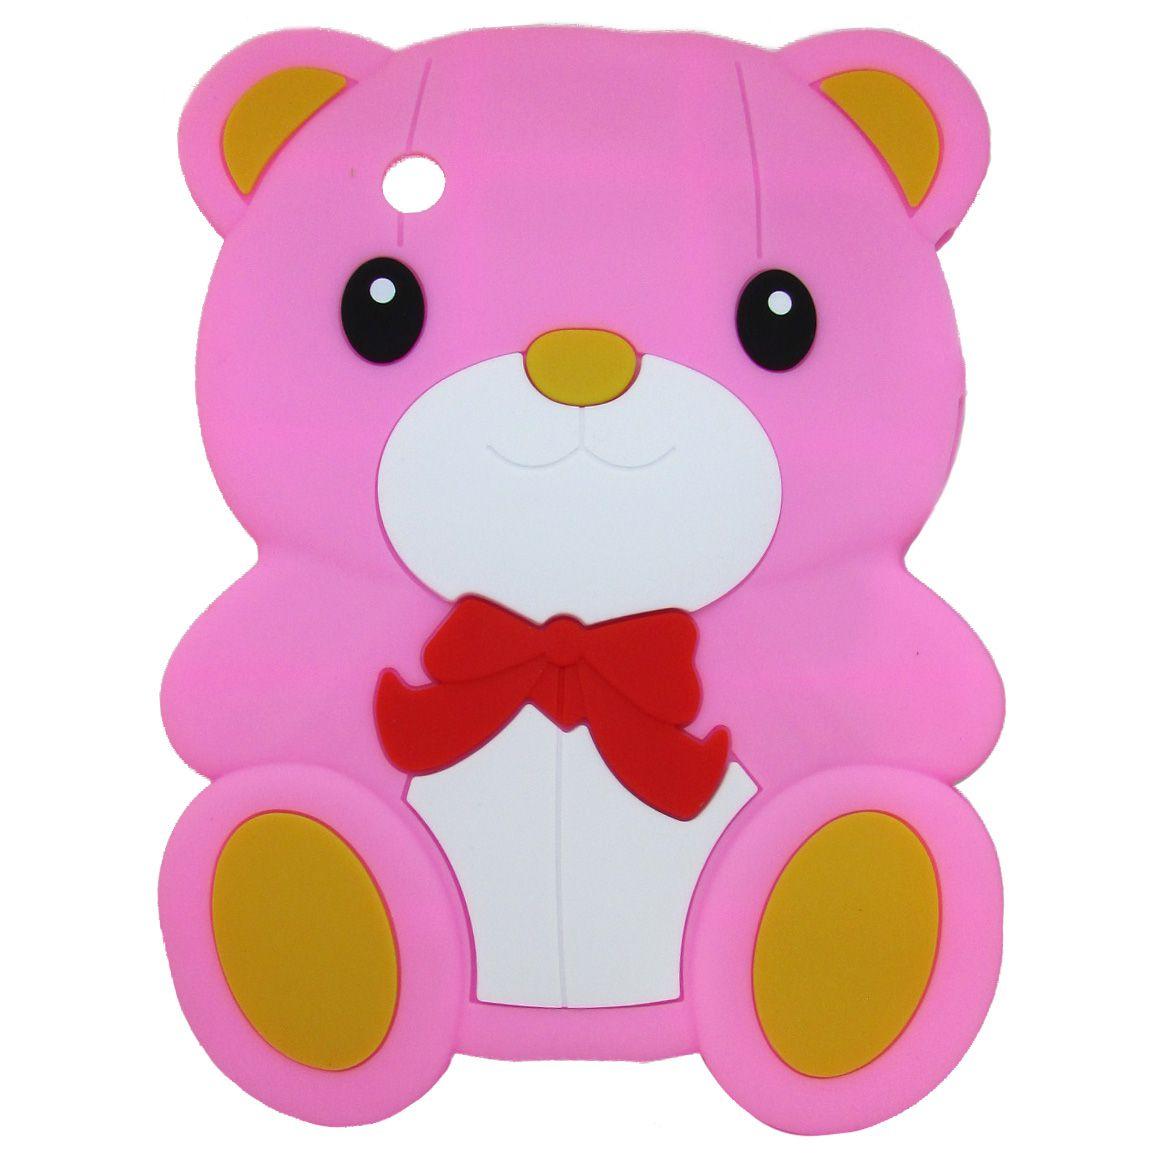 Capa Case emborrachada Infantil ursinho Rosa claro Samsung 7 Polegadas P3100 / P3110